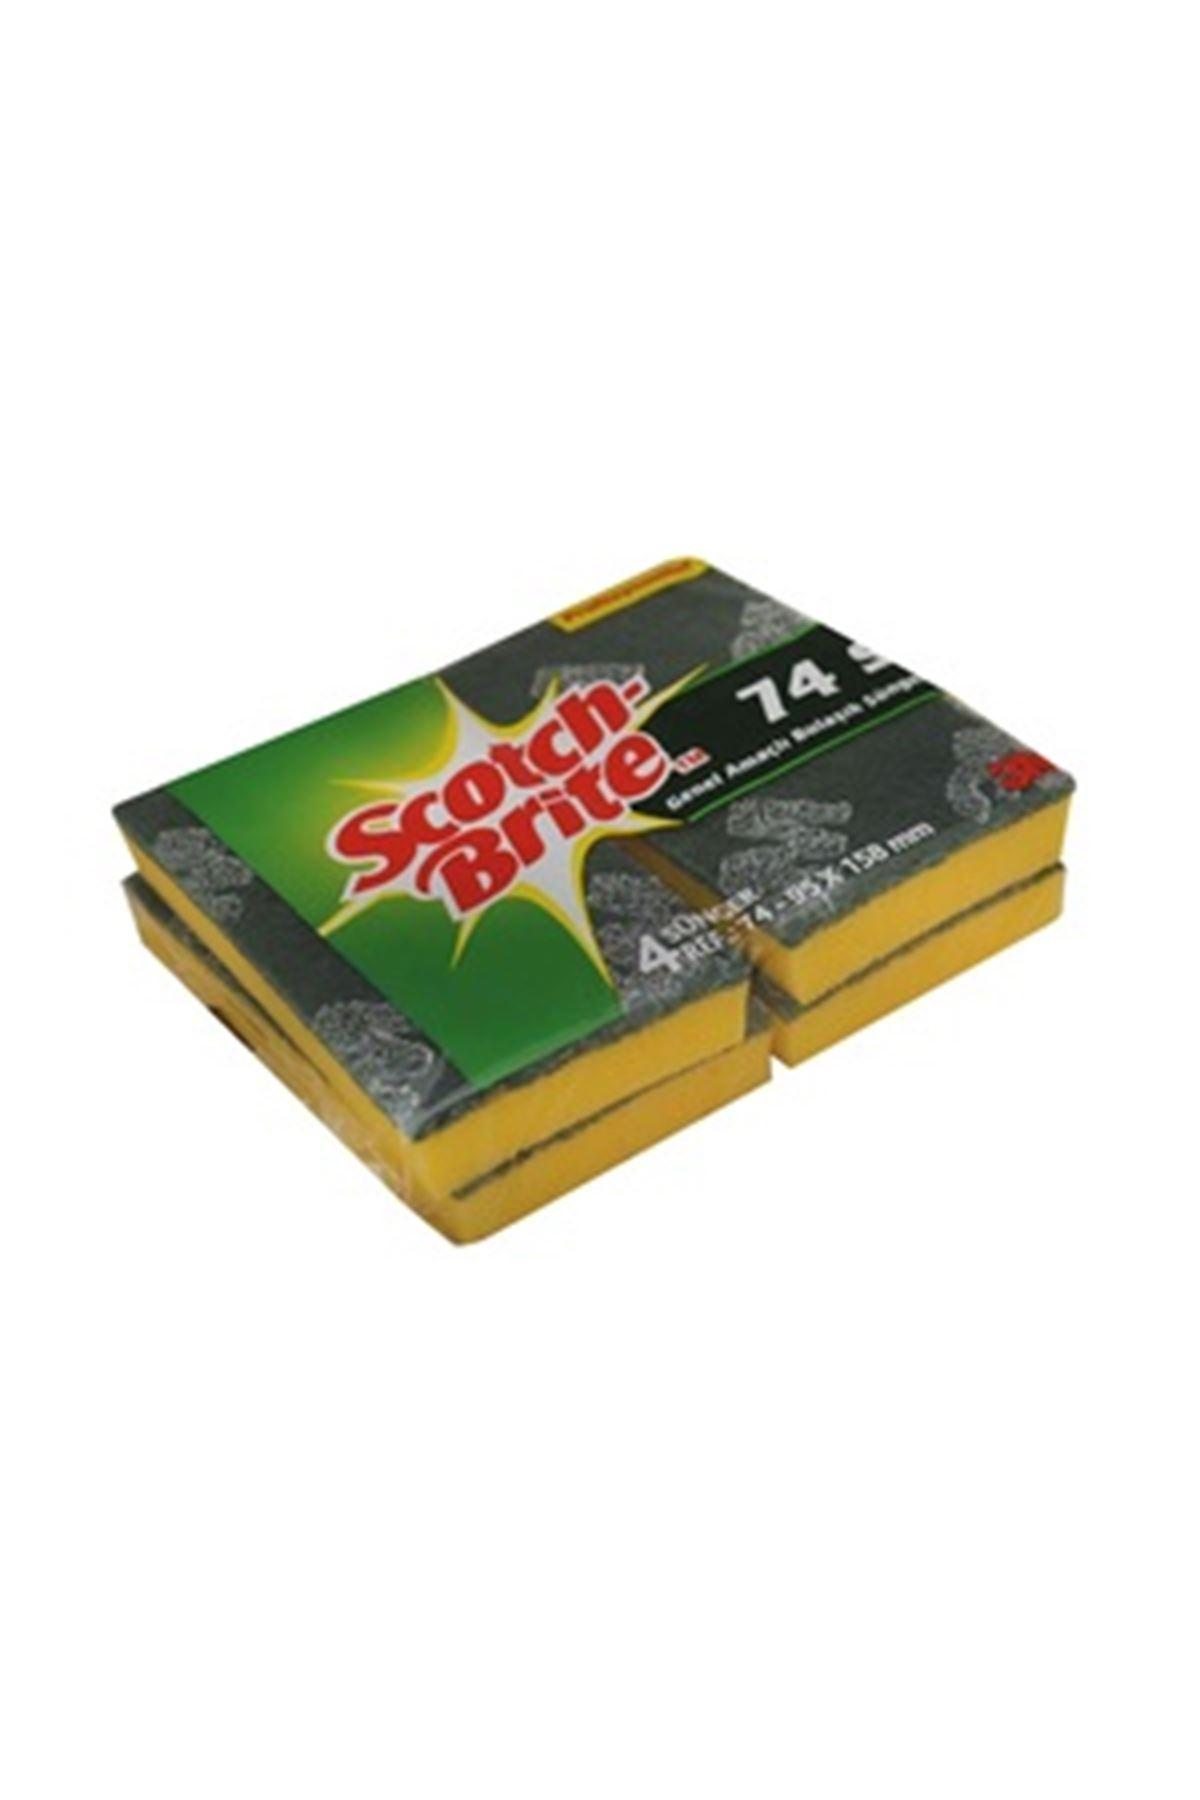 Scotch Brite Endüstriyel Bulaşık Süngeri 4'lü (SB74)